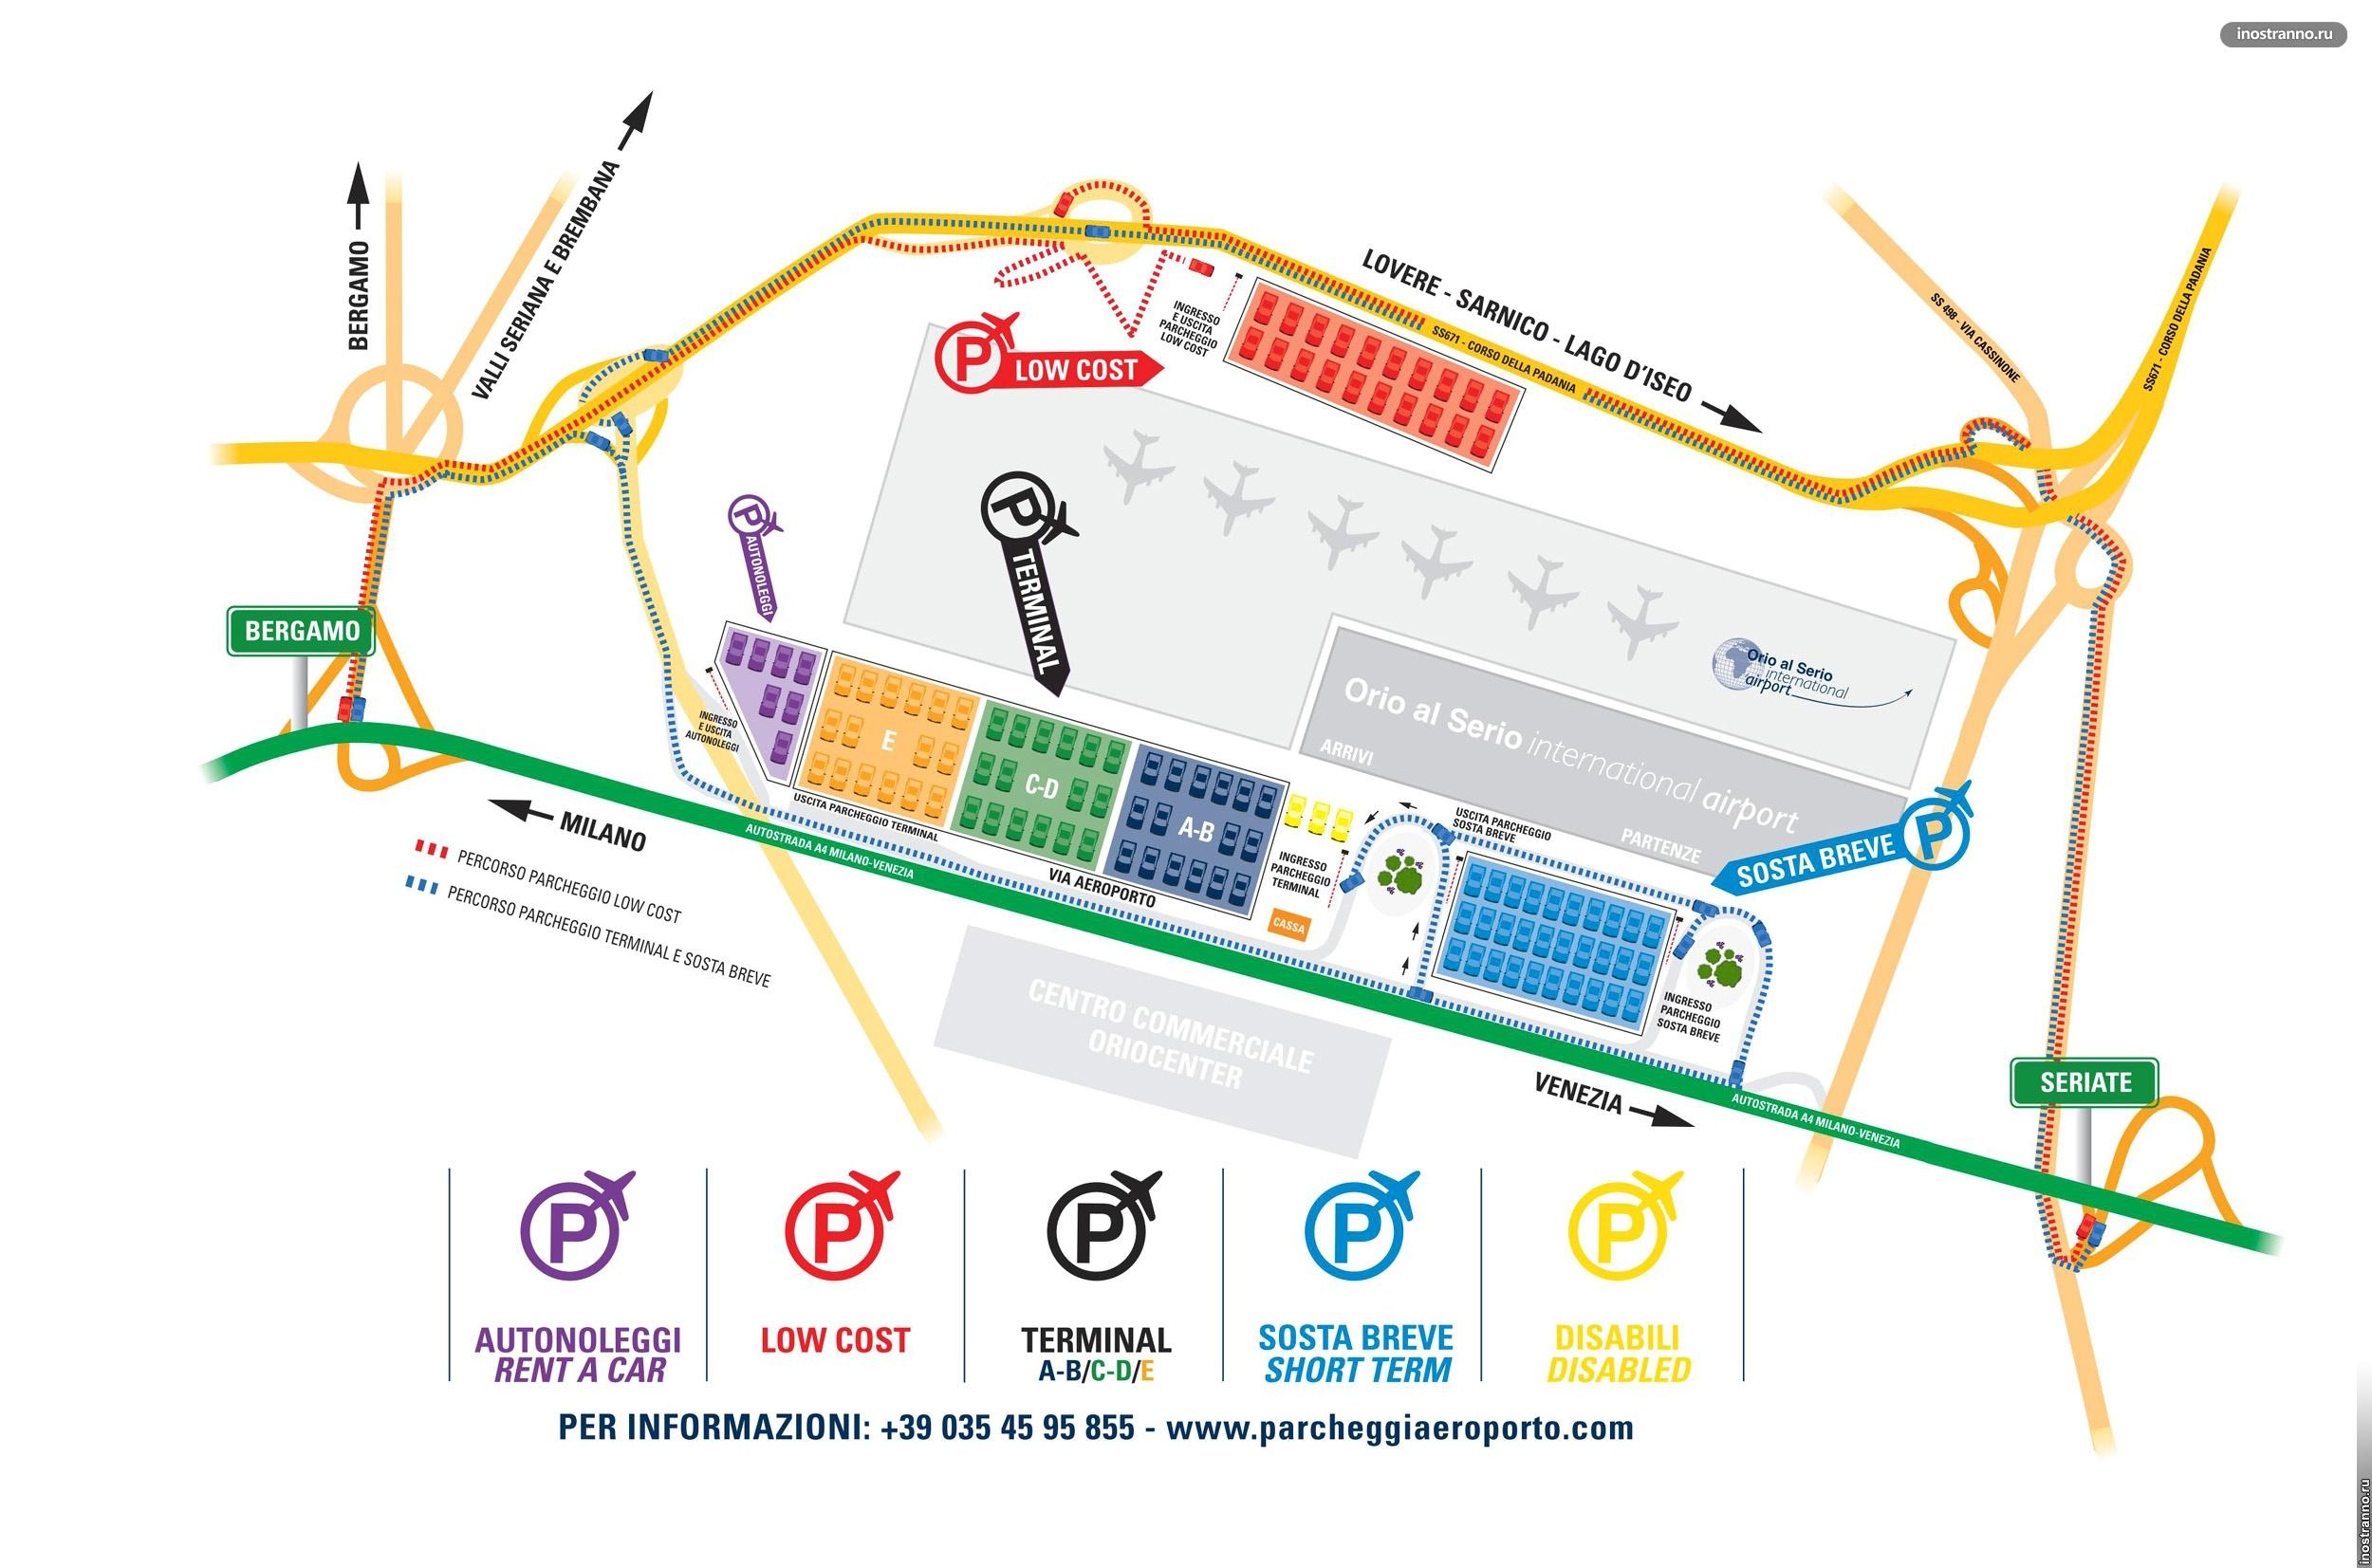 схема аэропорта бергамо